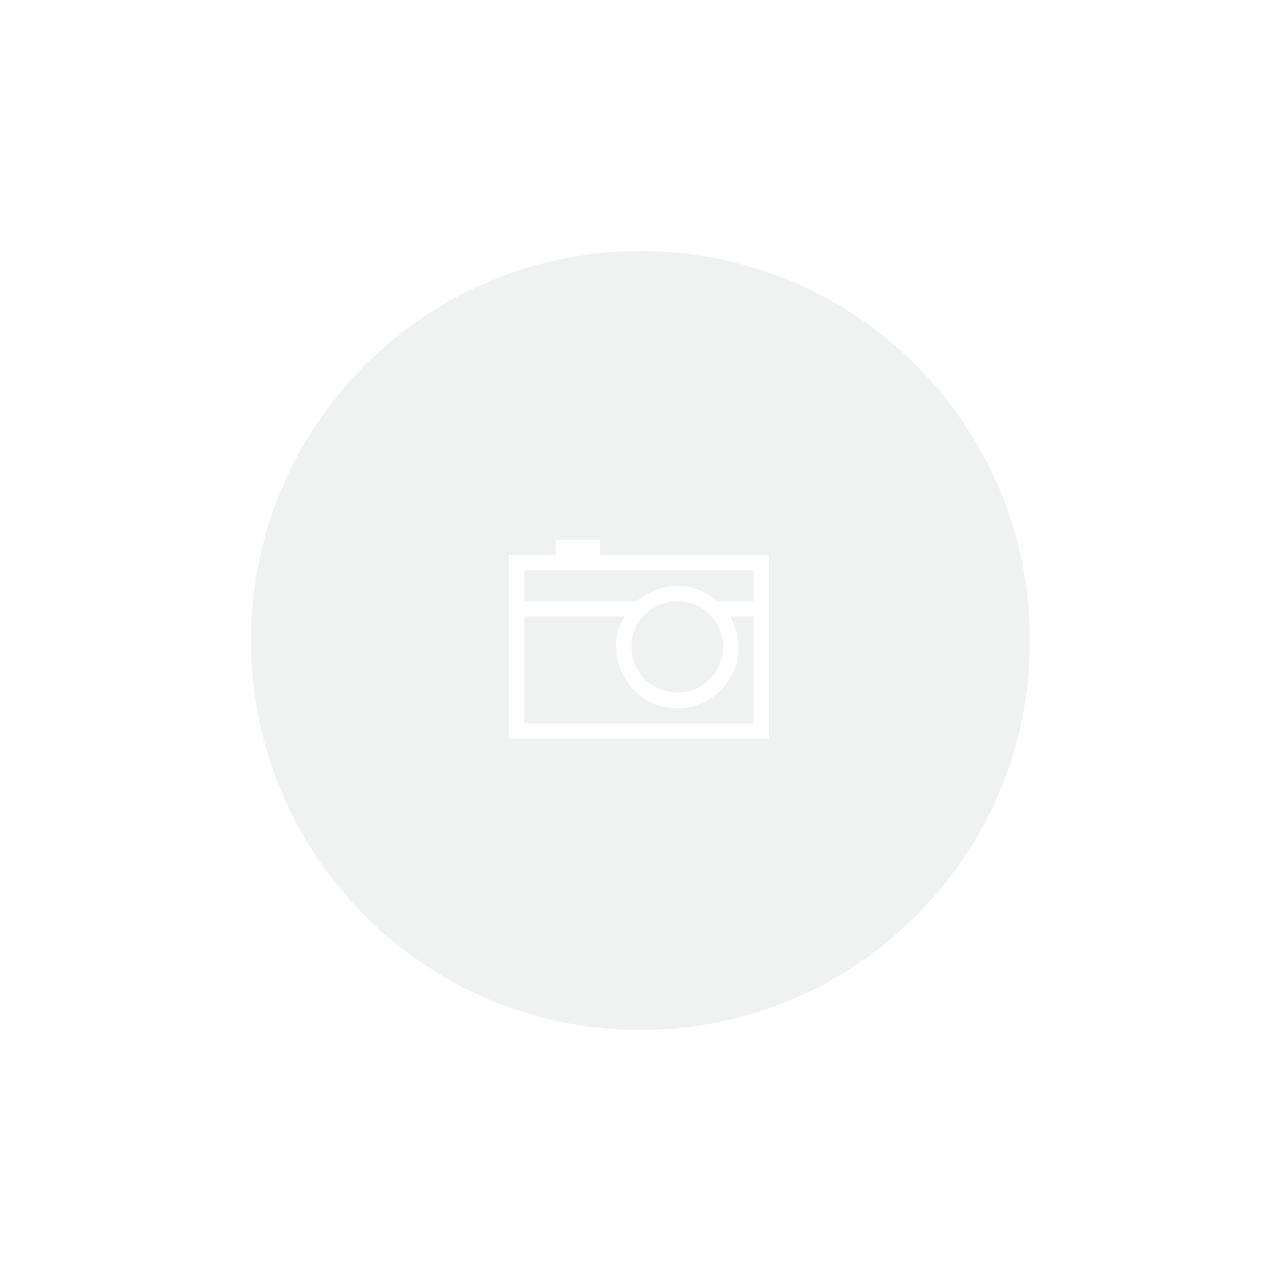 Stickers - Ref. 950D